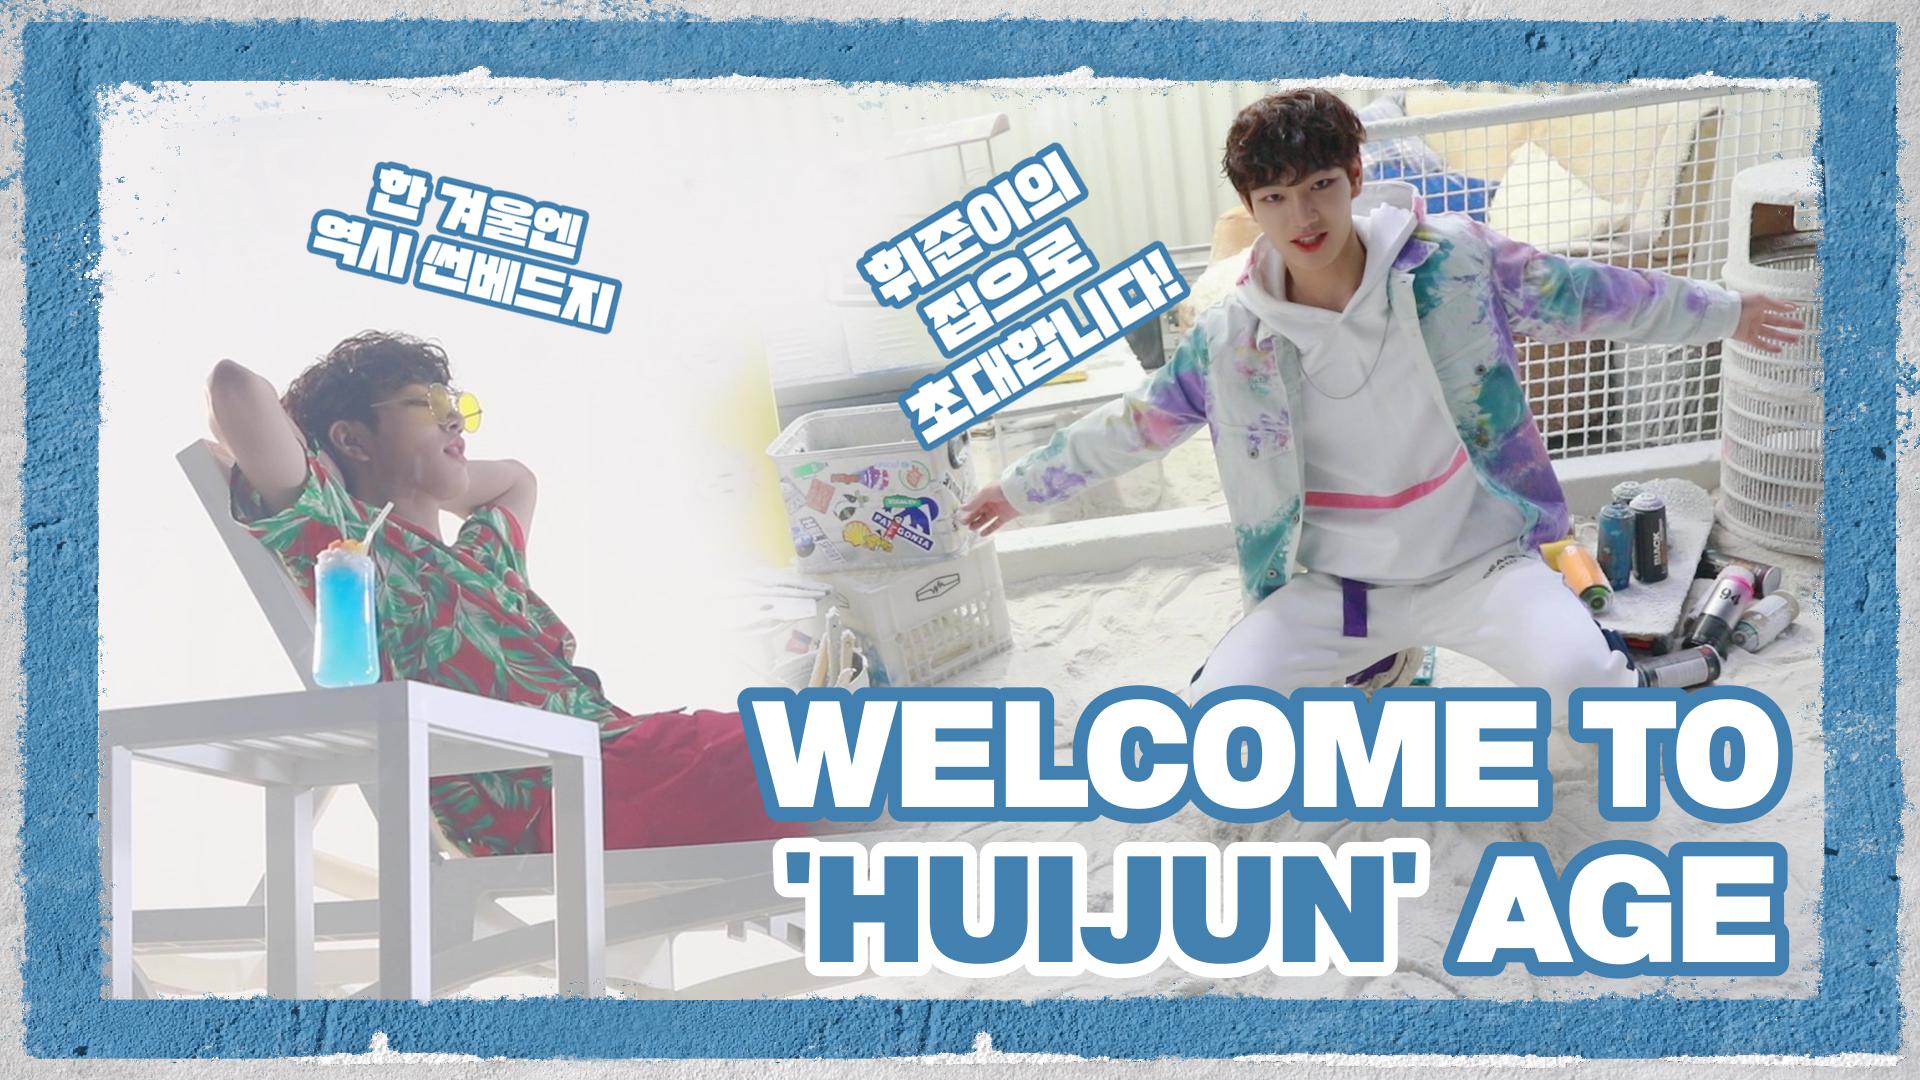 [Let's Play MCND] M-HINDㅣWELCOME TO 'HUIJUN' AGEㅣM/V 비하인드